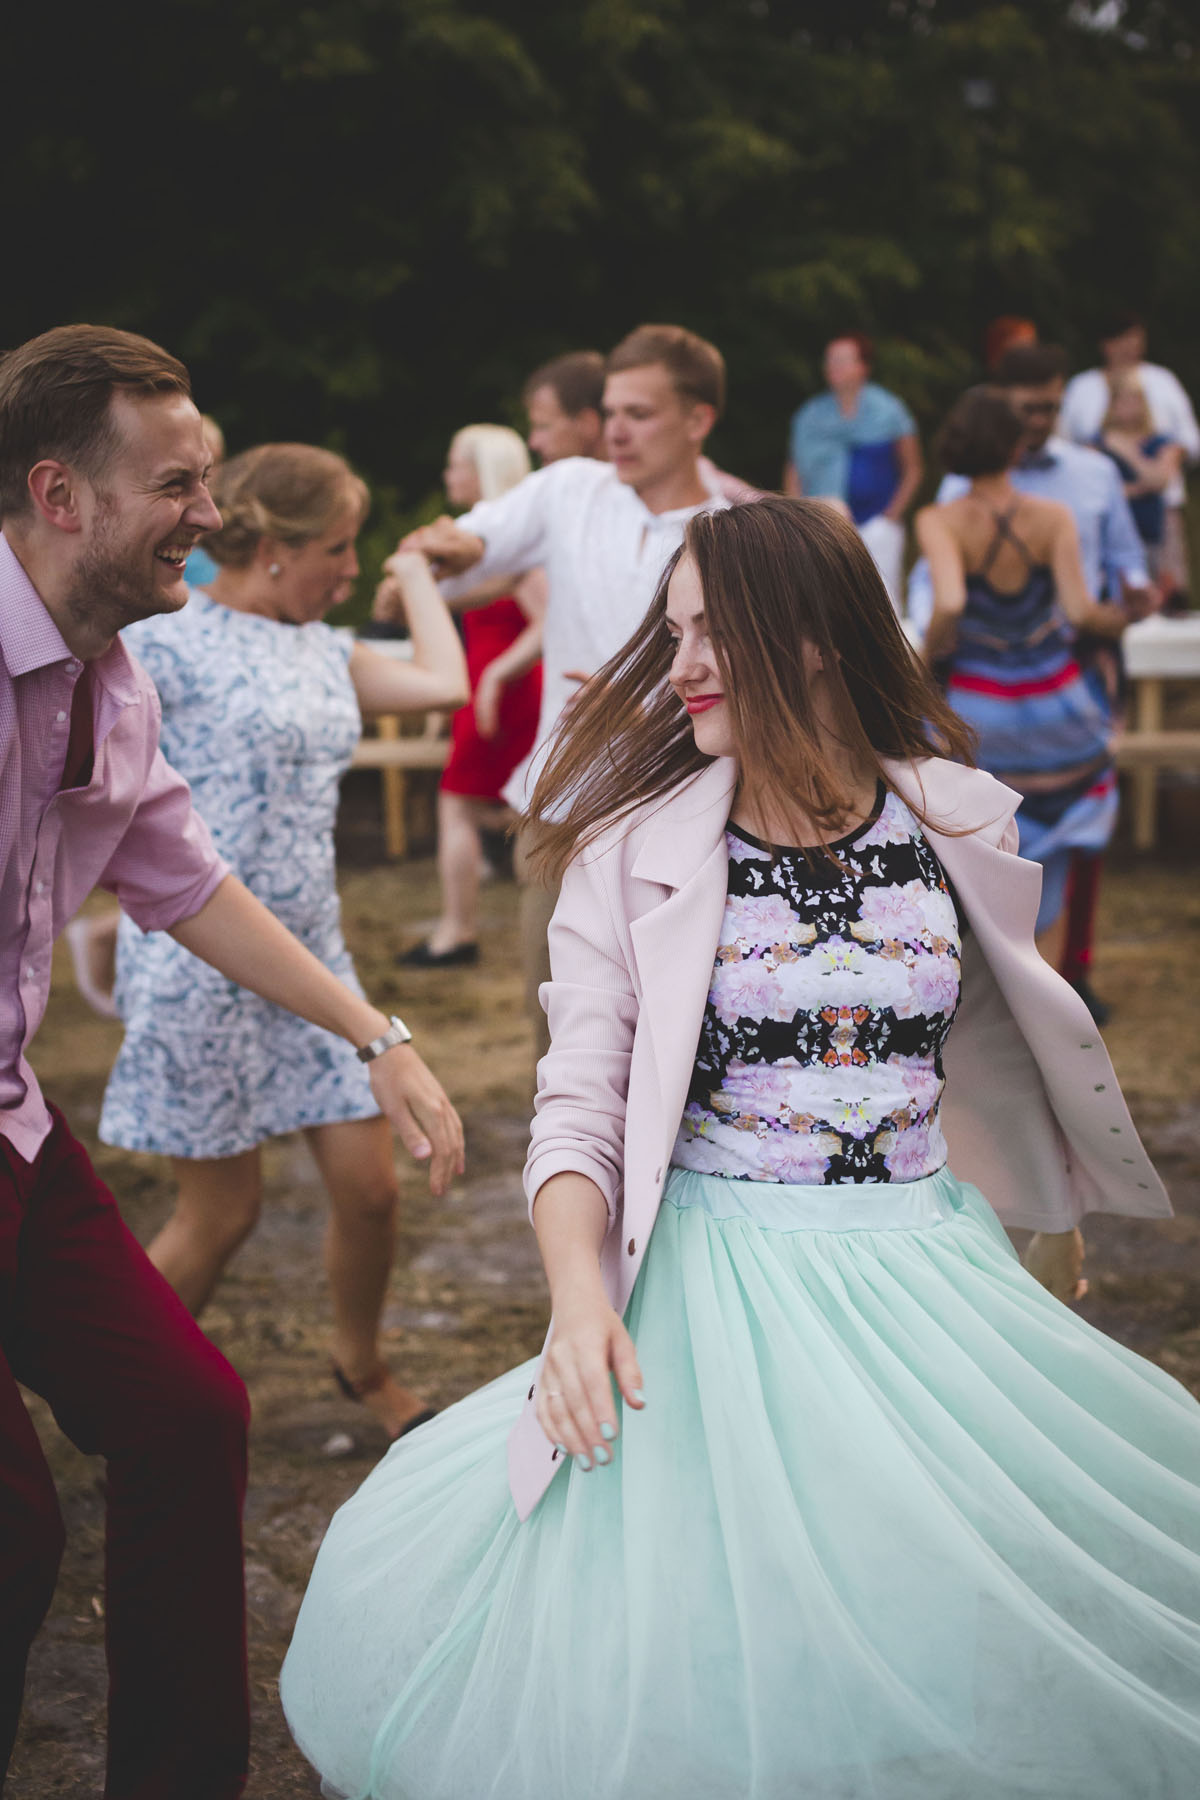 wedding-photos-119-estonian-wedding-photographer.jpg